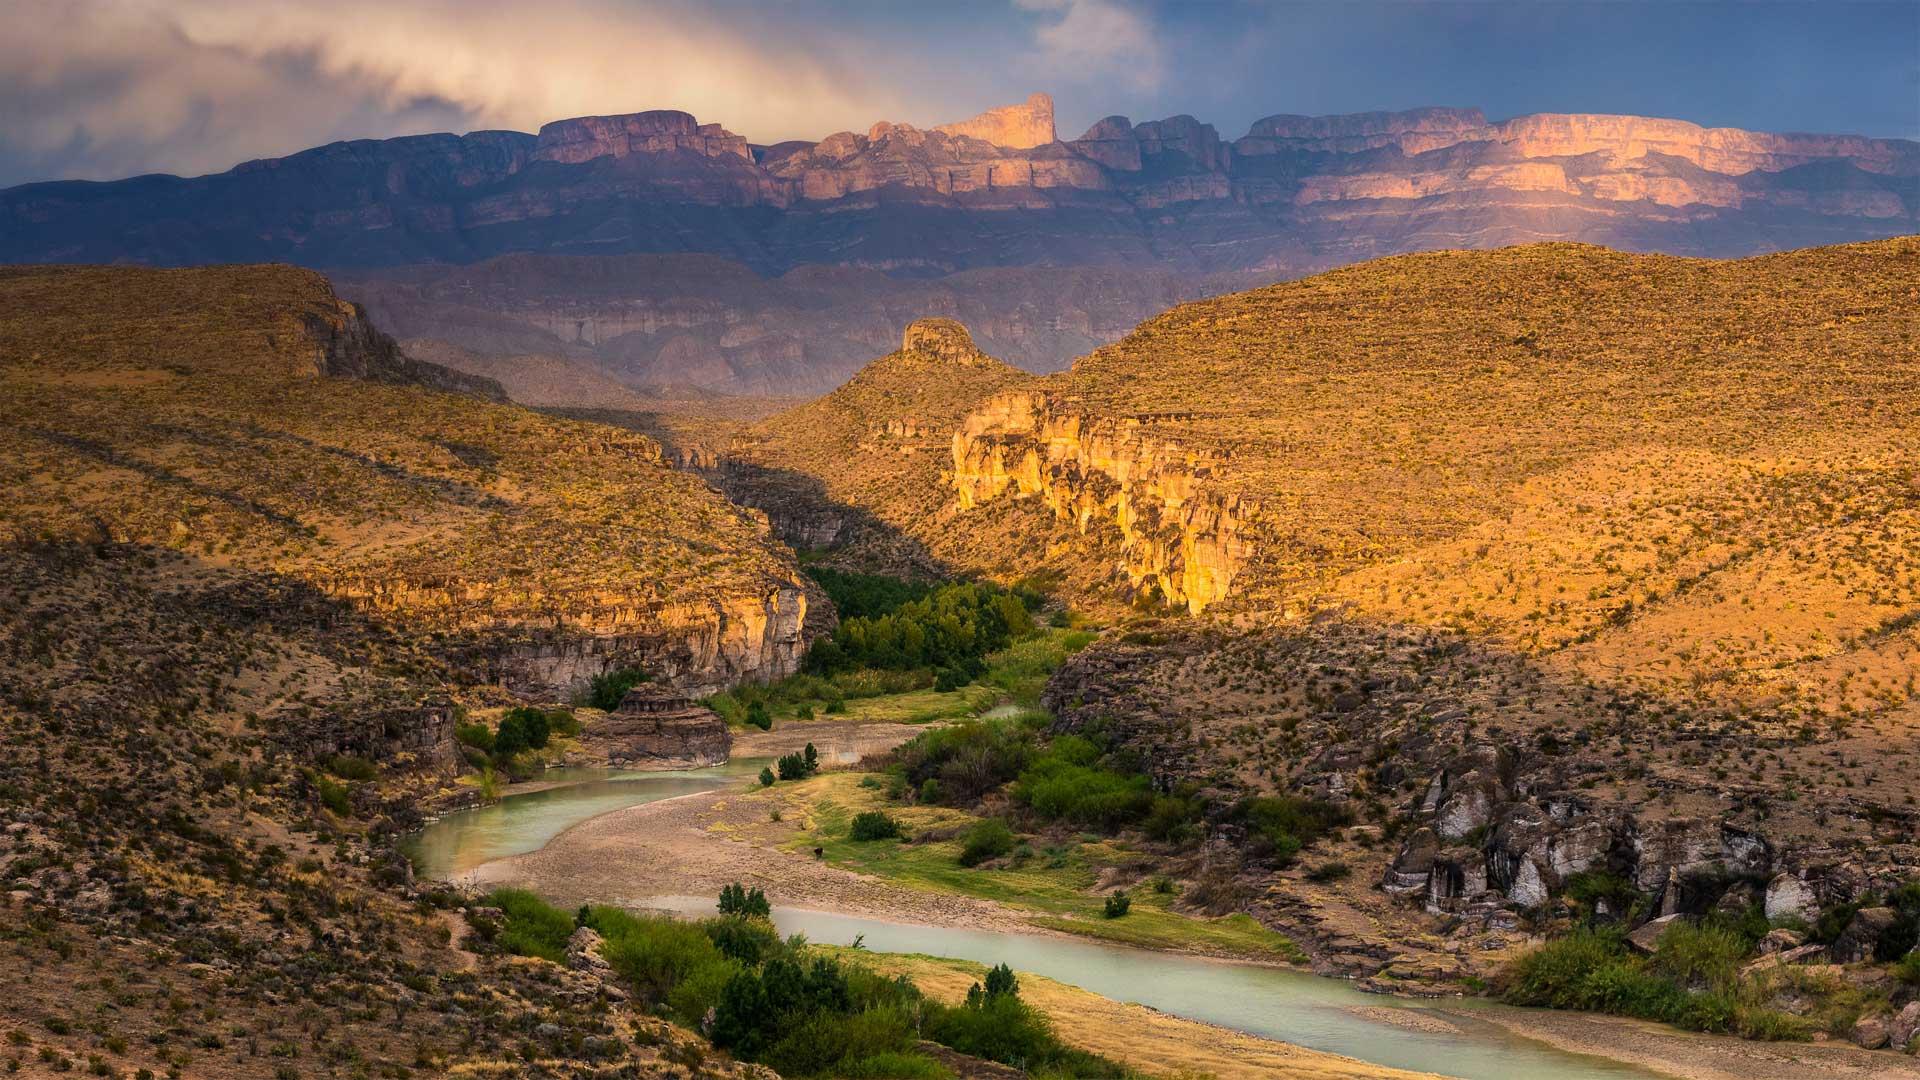 Rio Grande and Sierra del Carmen range in Big Bend National Park, Texas (© Grant Ordelheide/Tandem Stills + Motion)(Bing United States)